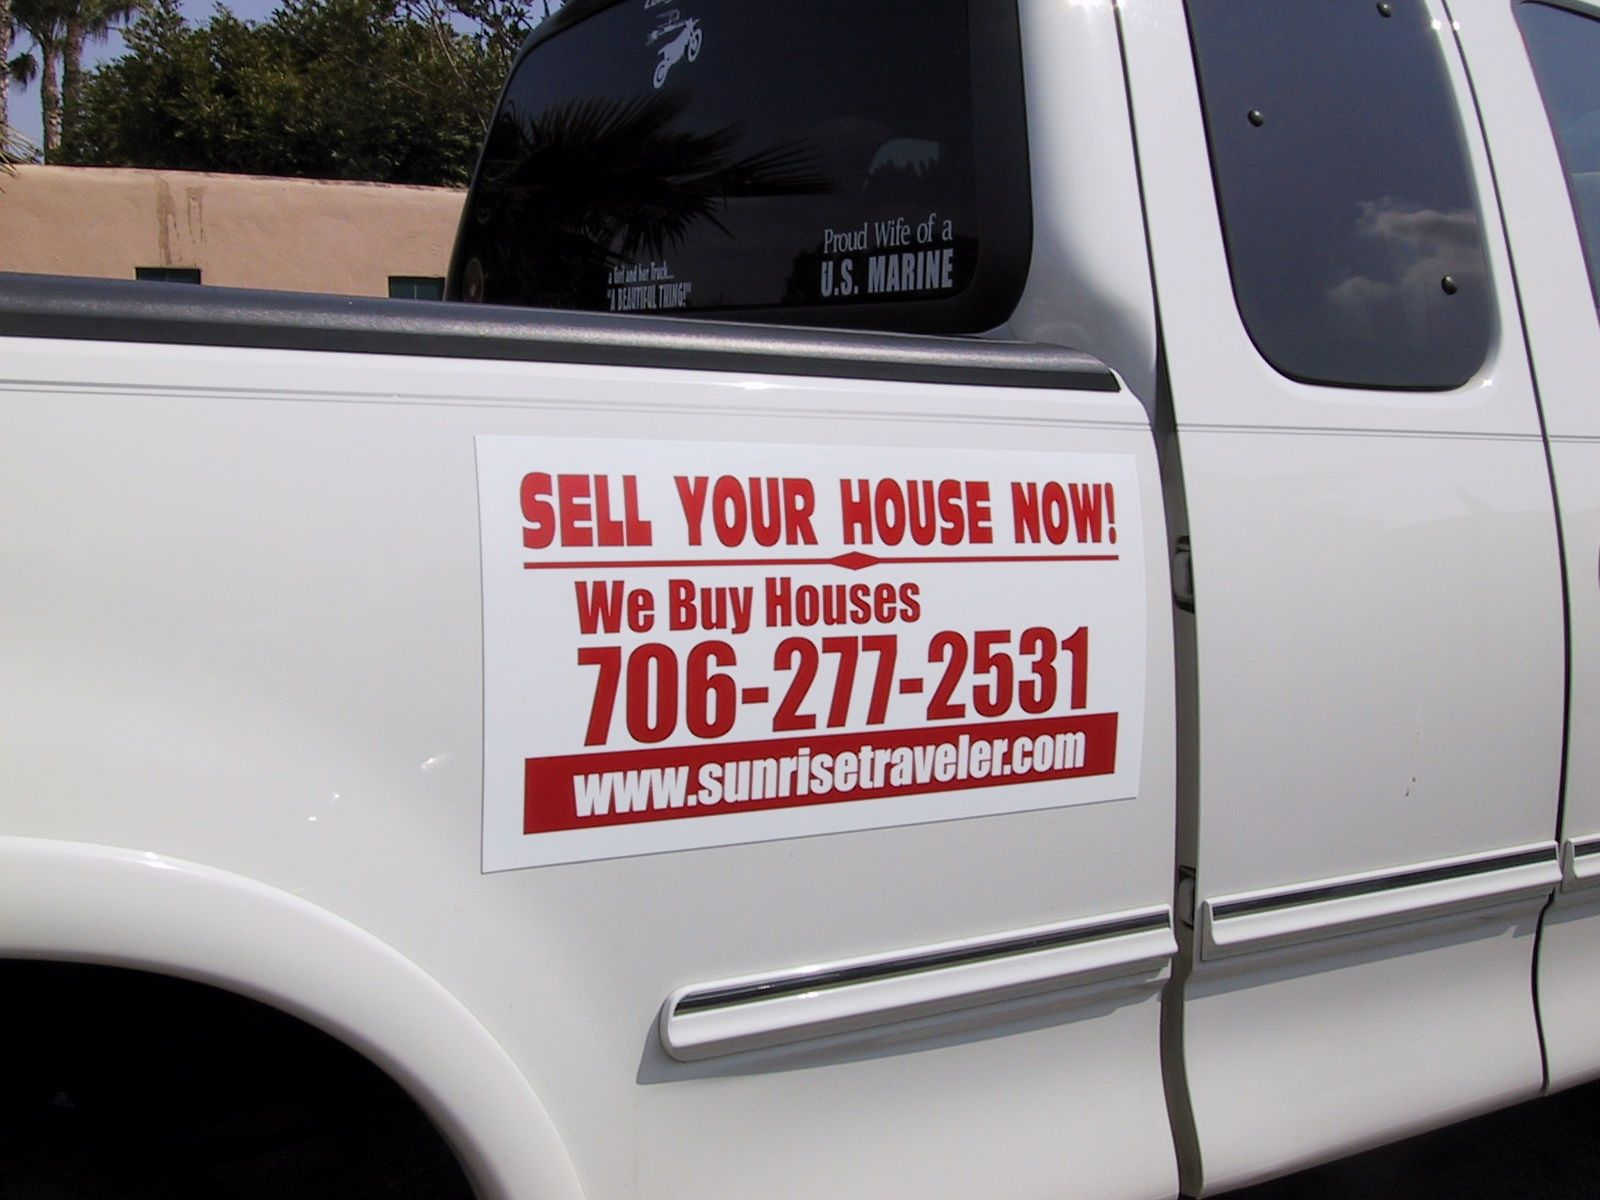 We Buy Houses Car Magnets | Arts - Arts